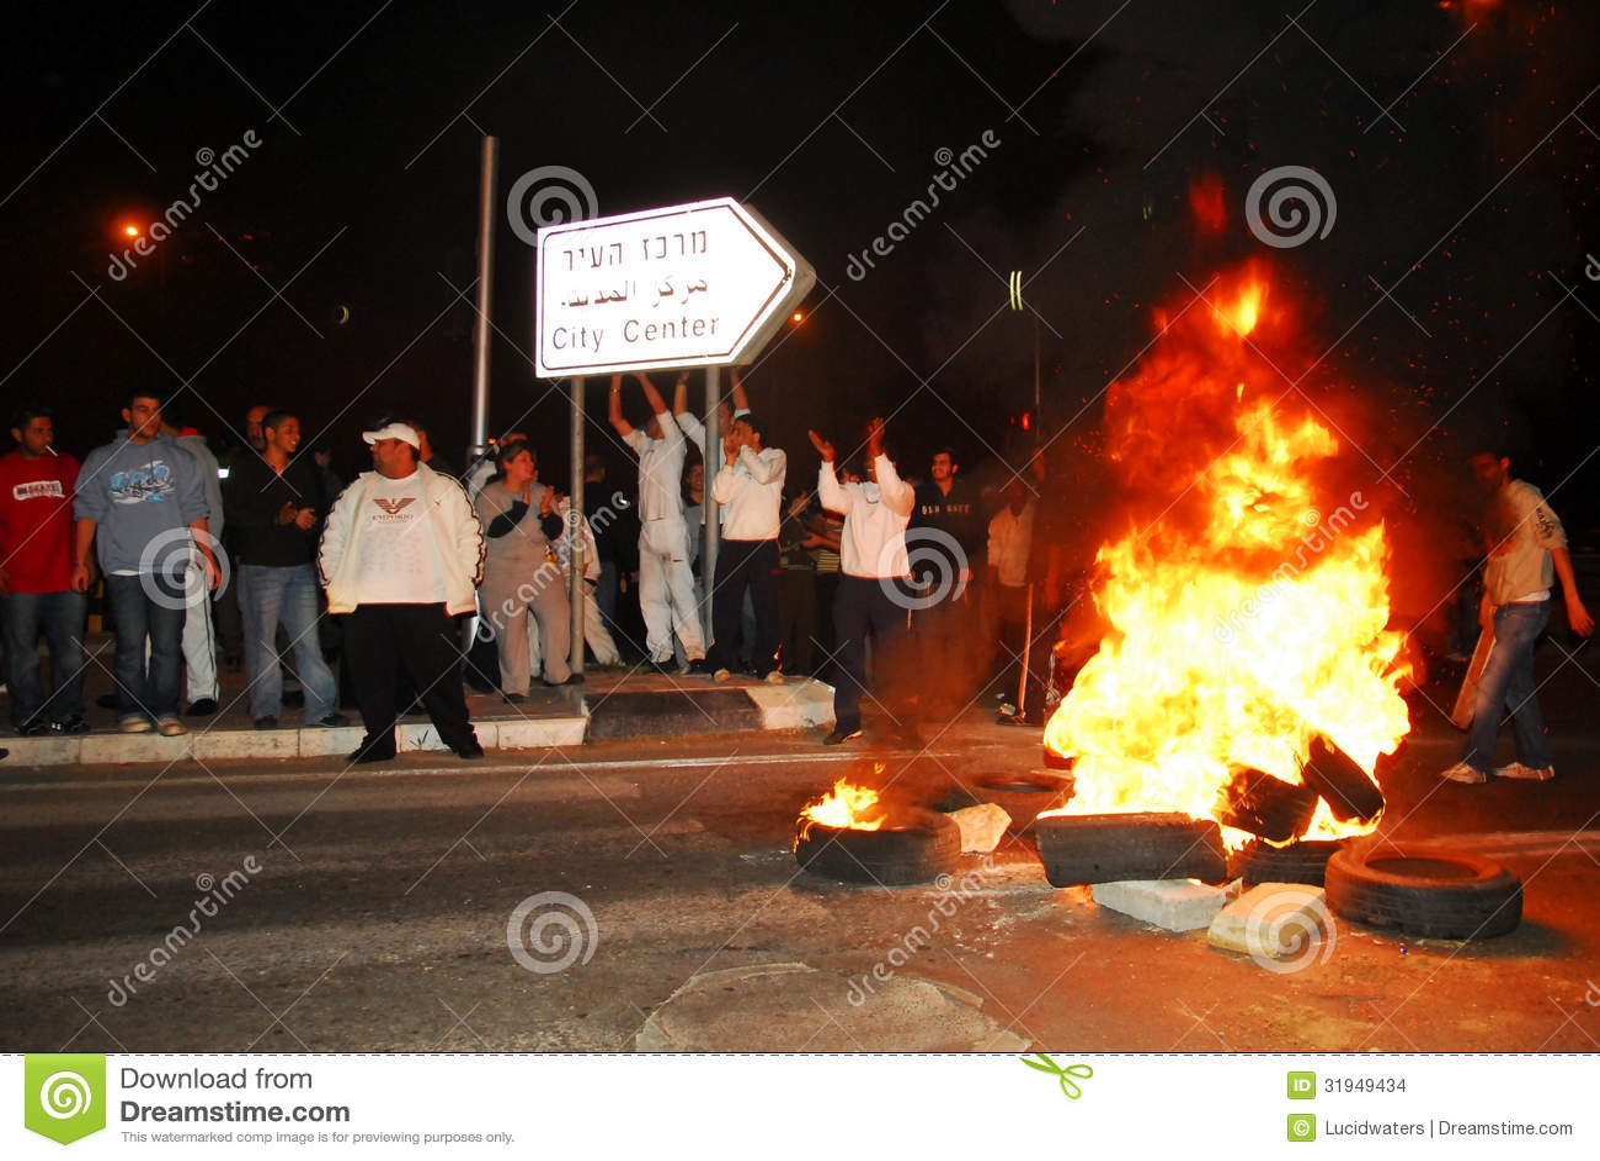 Download Riot editorial stock image. Image of demonstrators, demonstration - 31949434